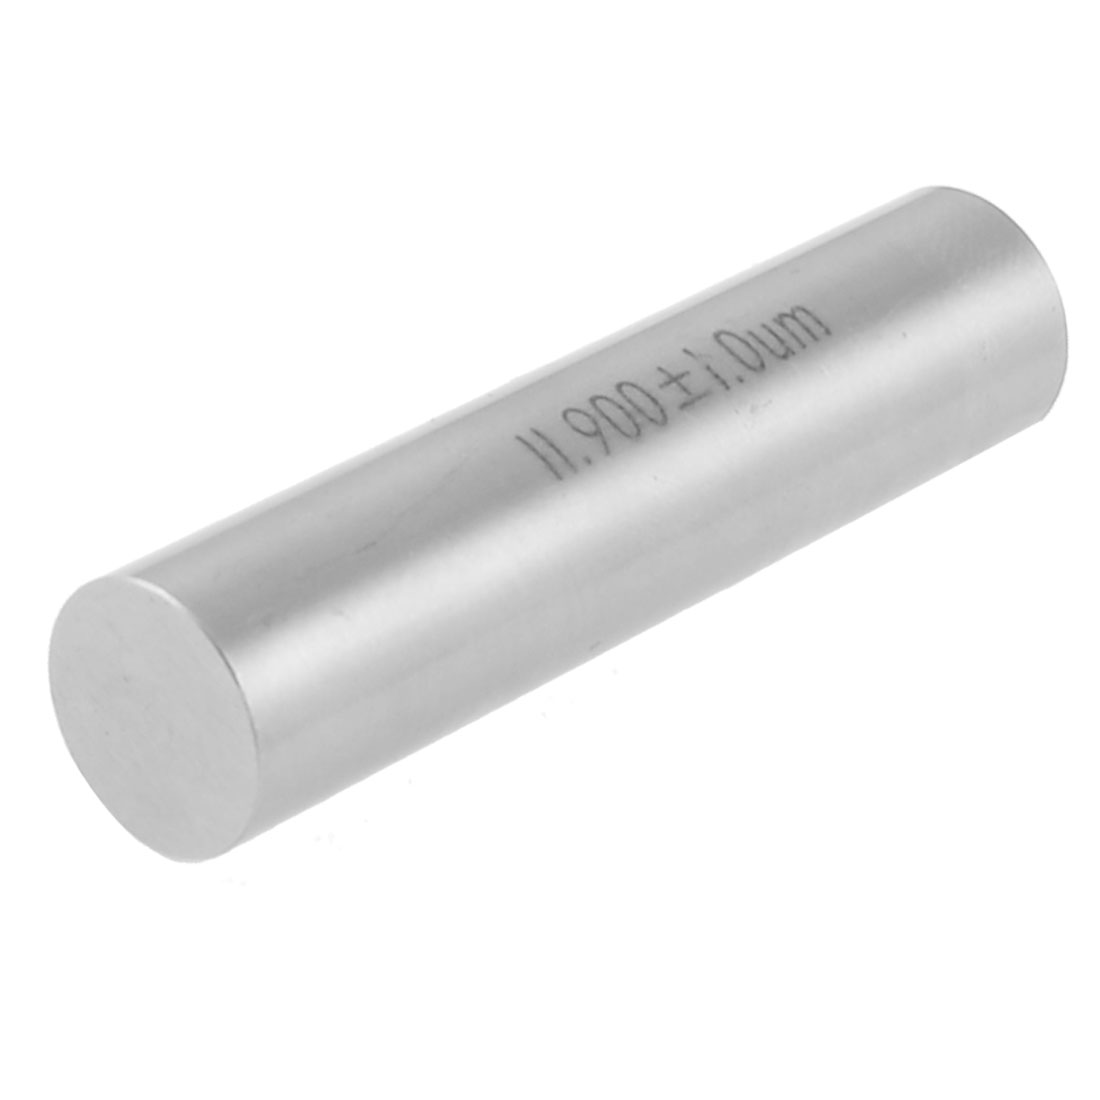 50mm Long 11.90mm Diameter Tungsten Carbide Cylinder Pin Gage Gauge